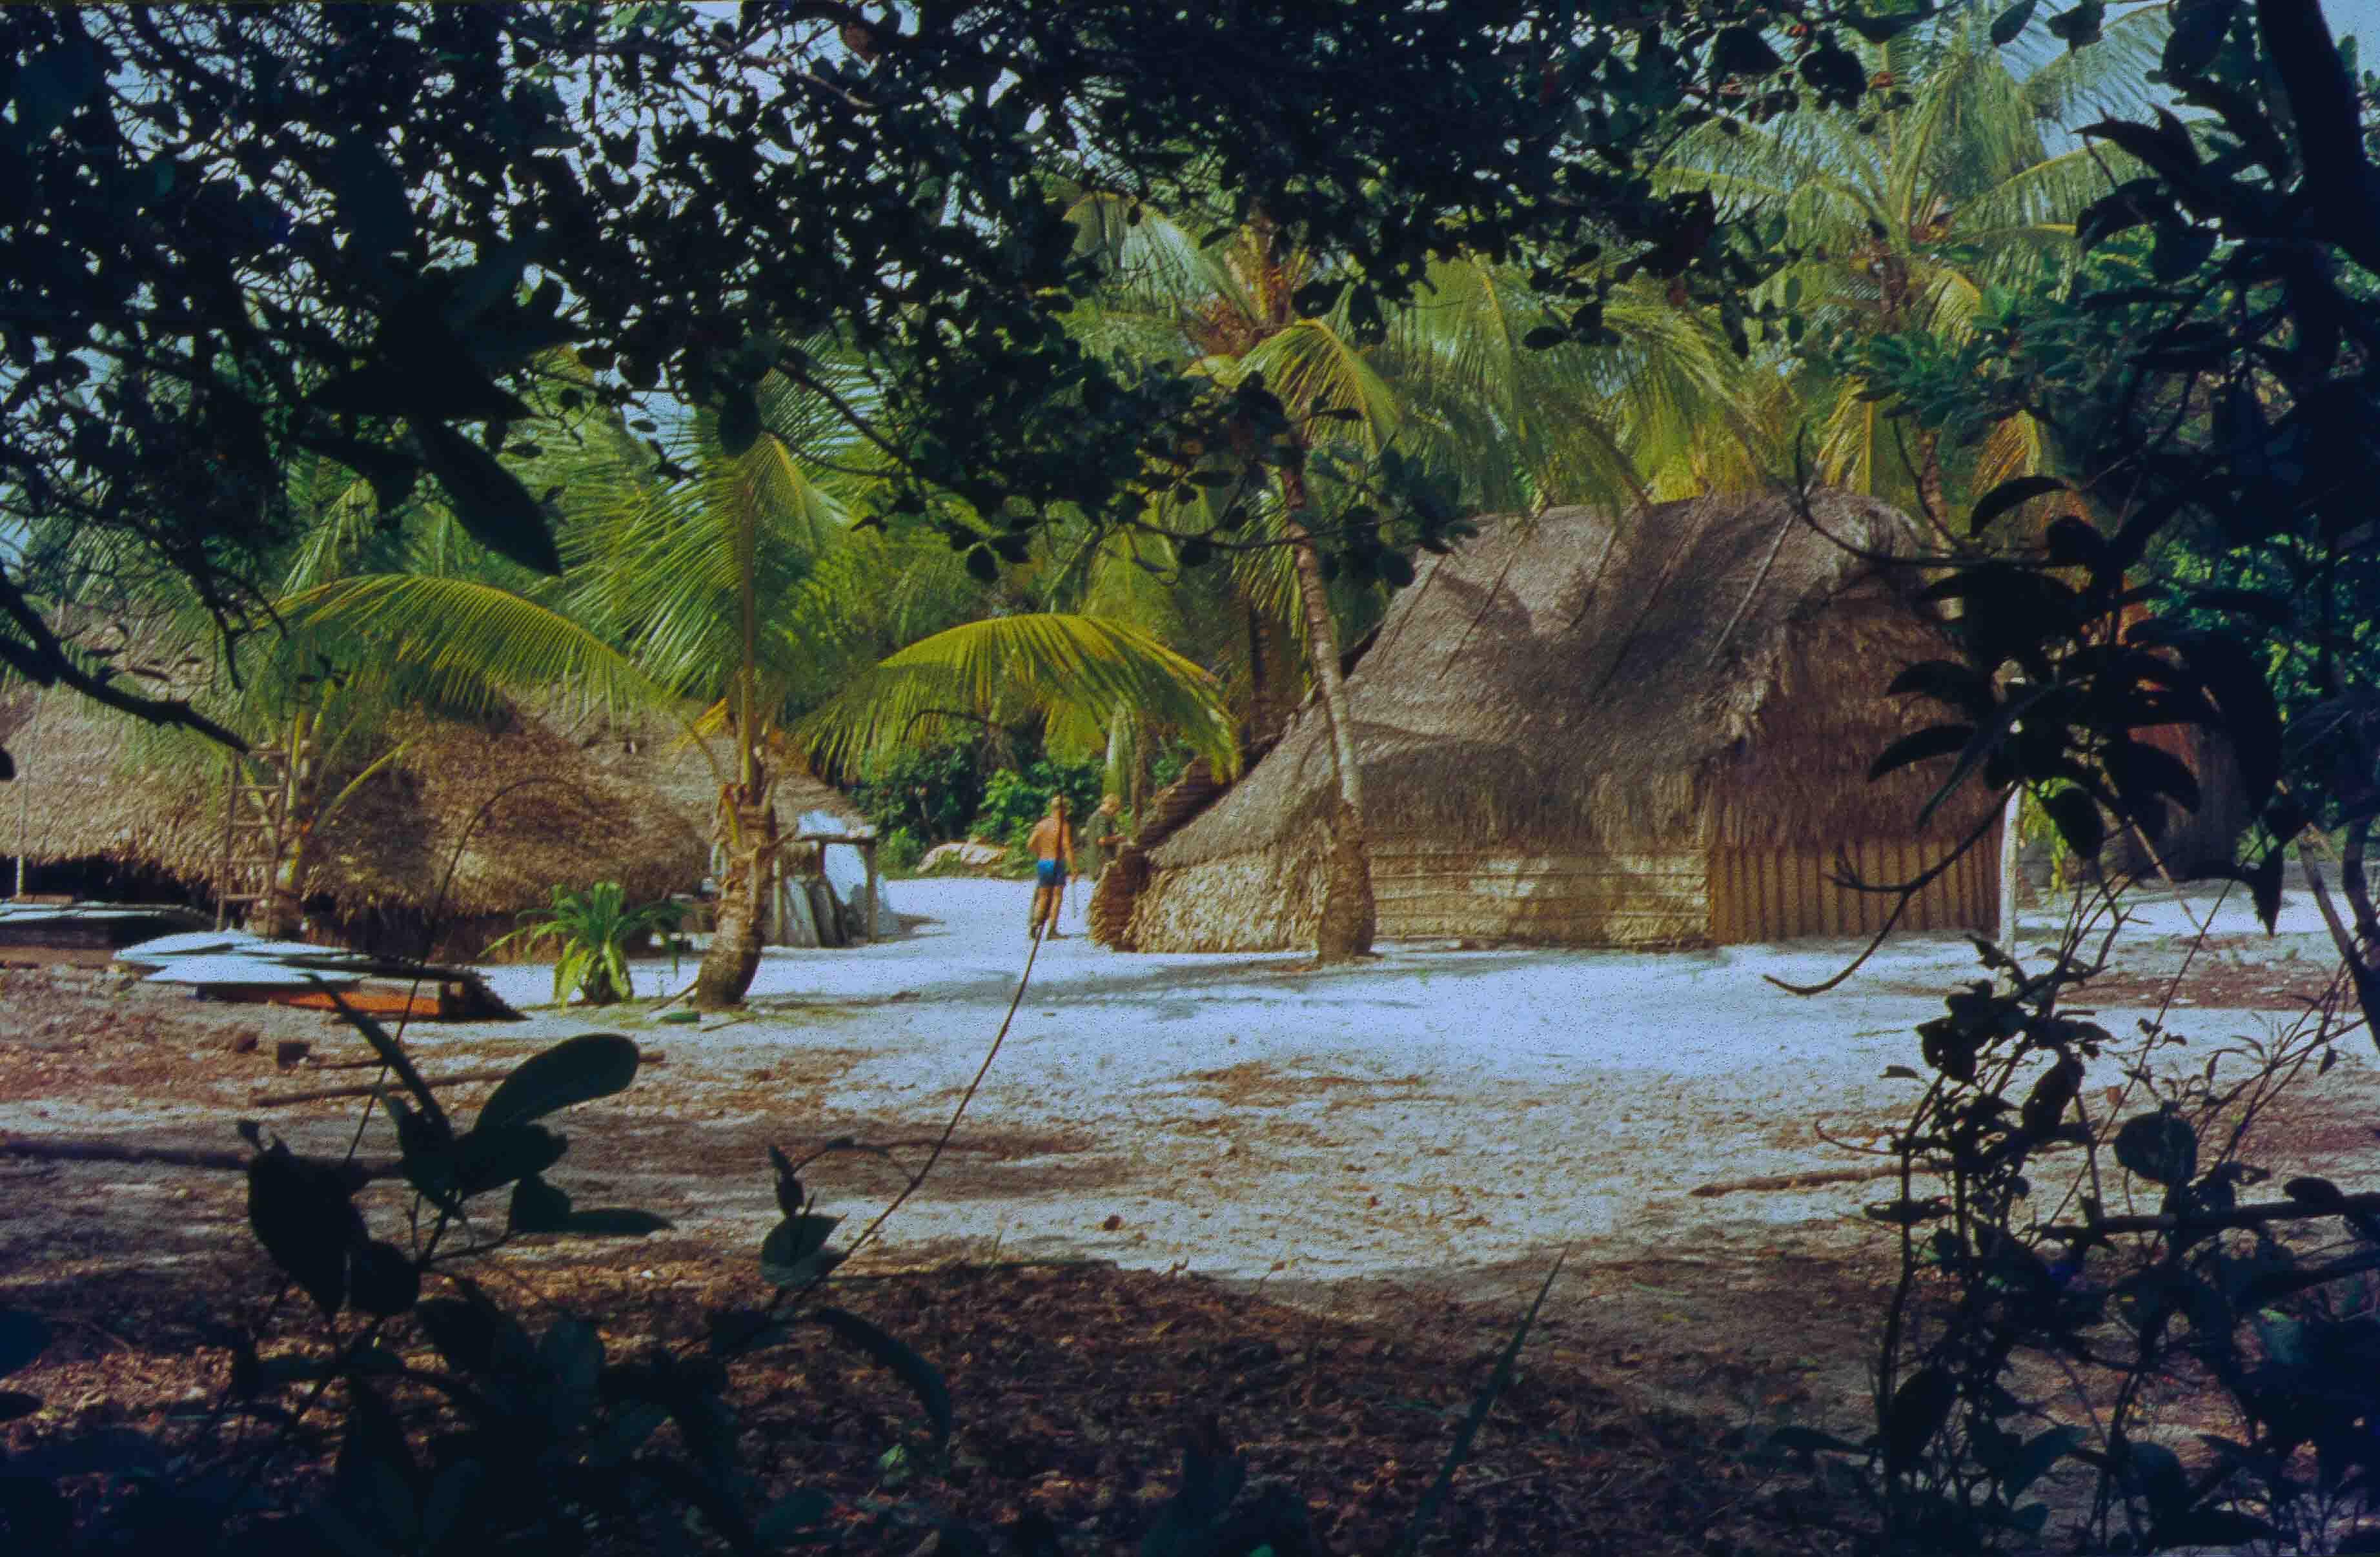 403. Suriname